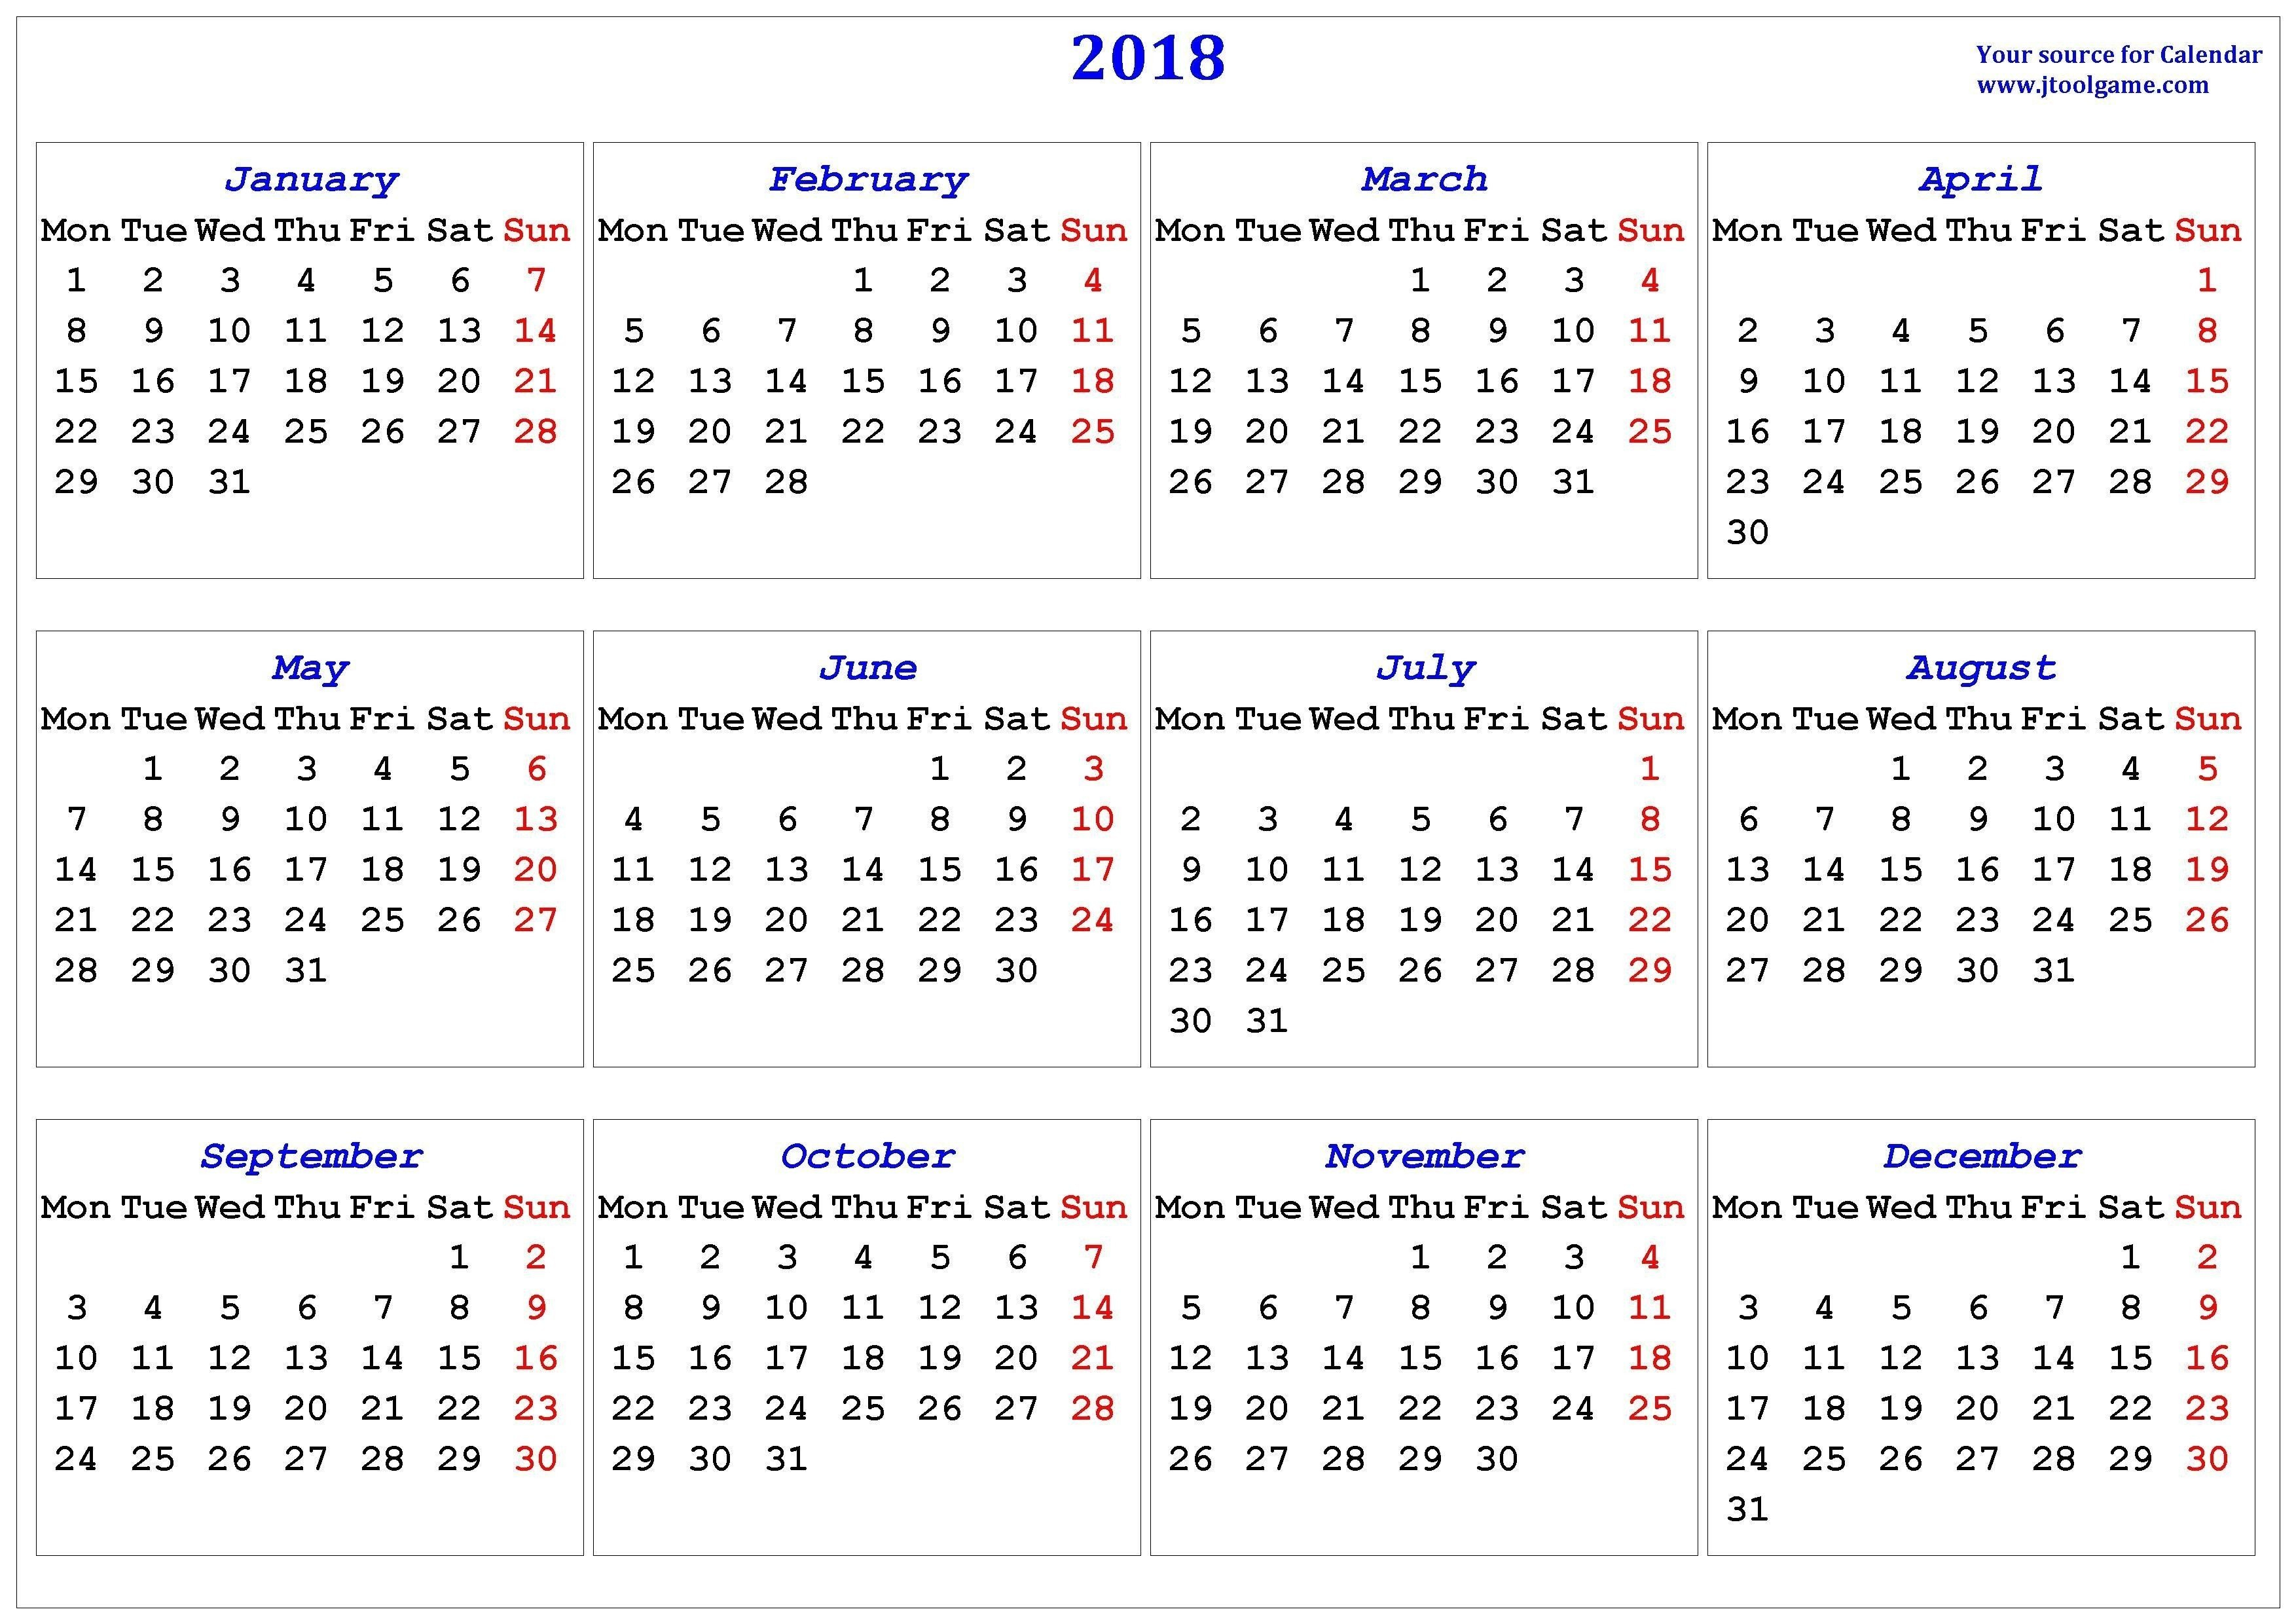 Recognizing Calendar 2019 Crestin Ortodox Calendar Free Printable Calendar 0Rtodox 2019